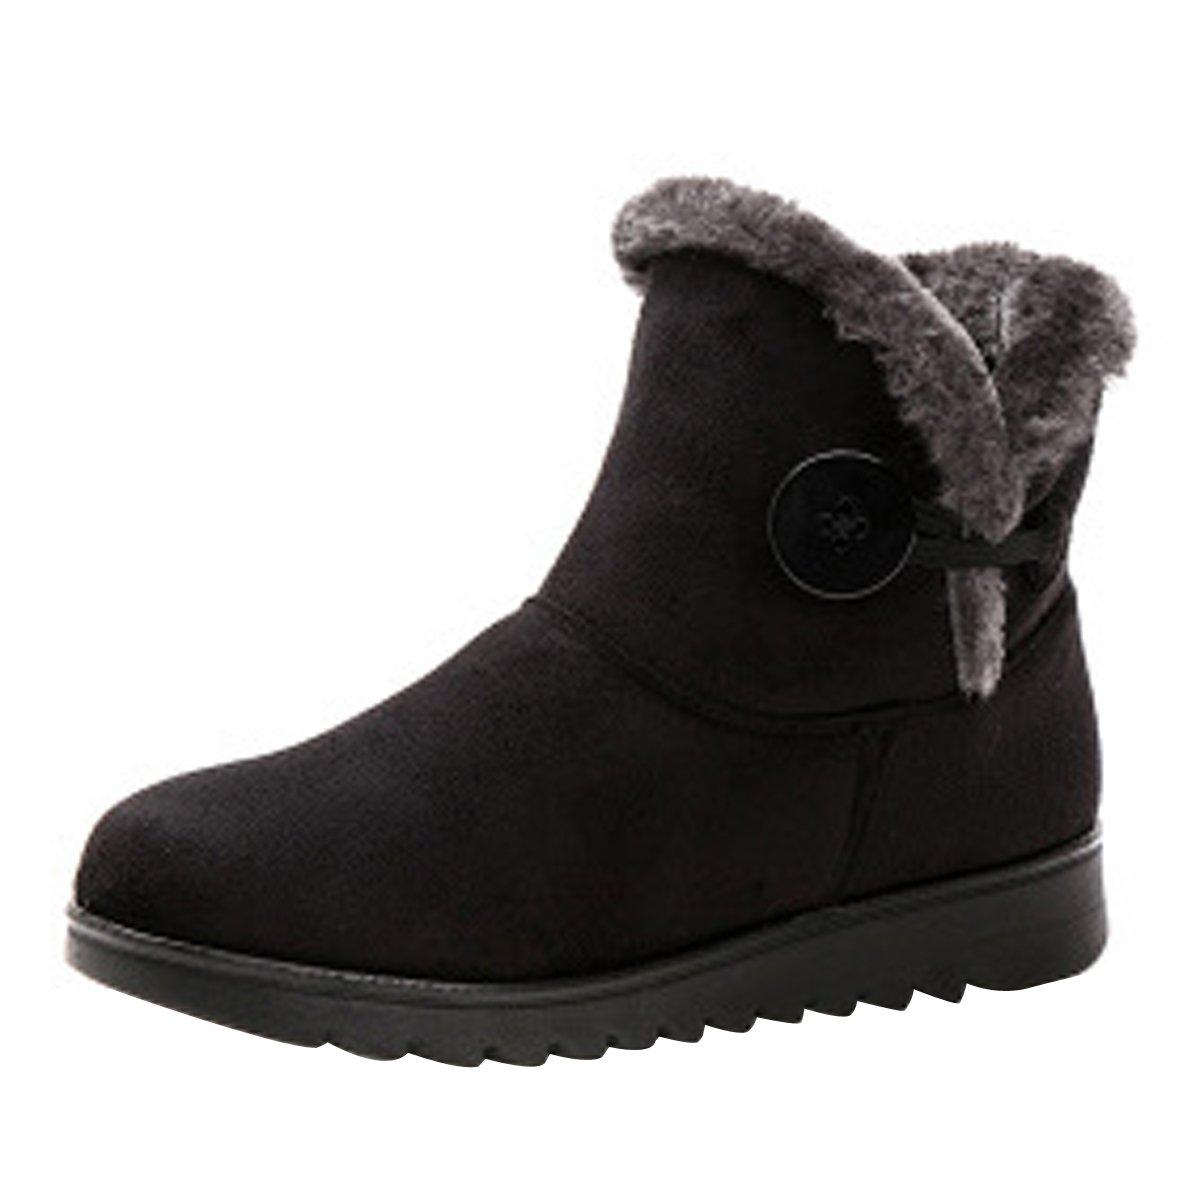 VFDB Women Winter Botton Snow Ankle Boots Fur Warm Platform Slip On Booties